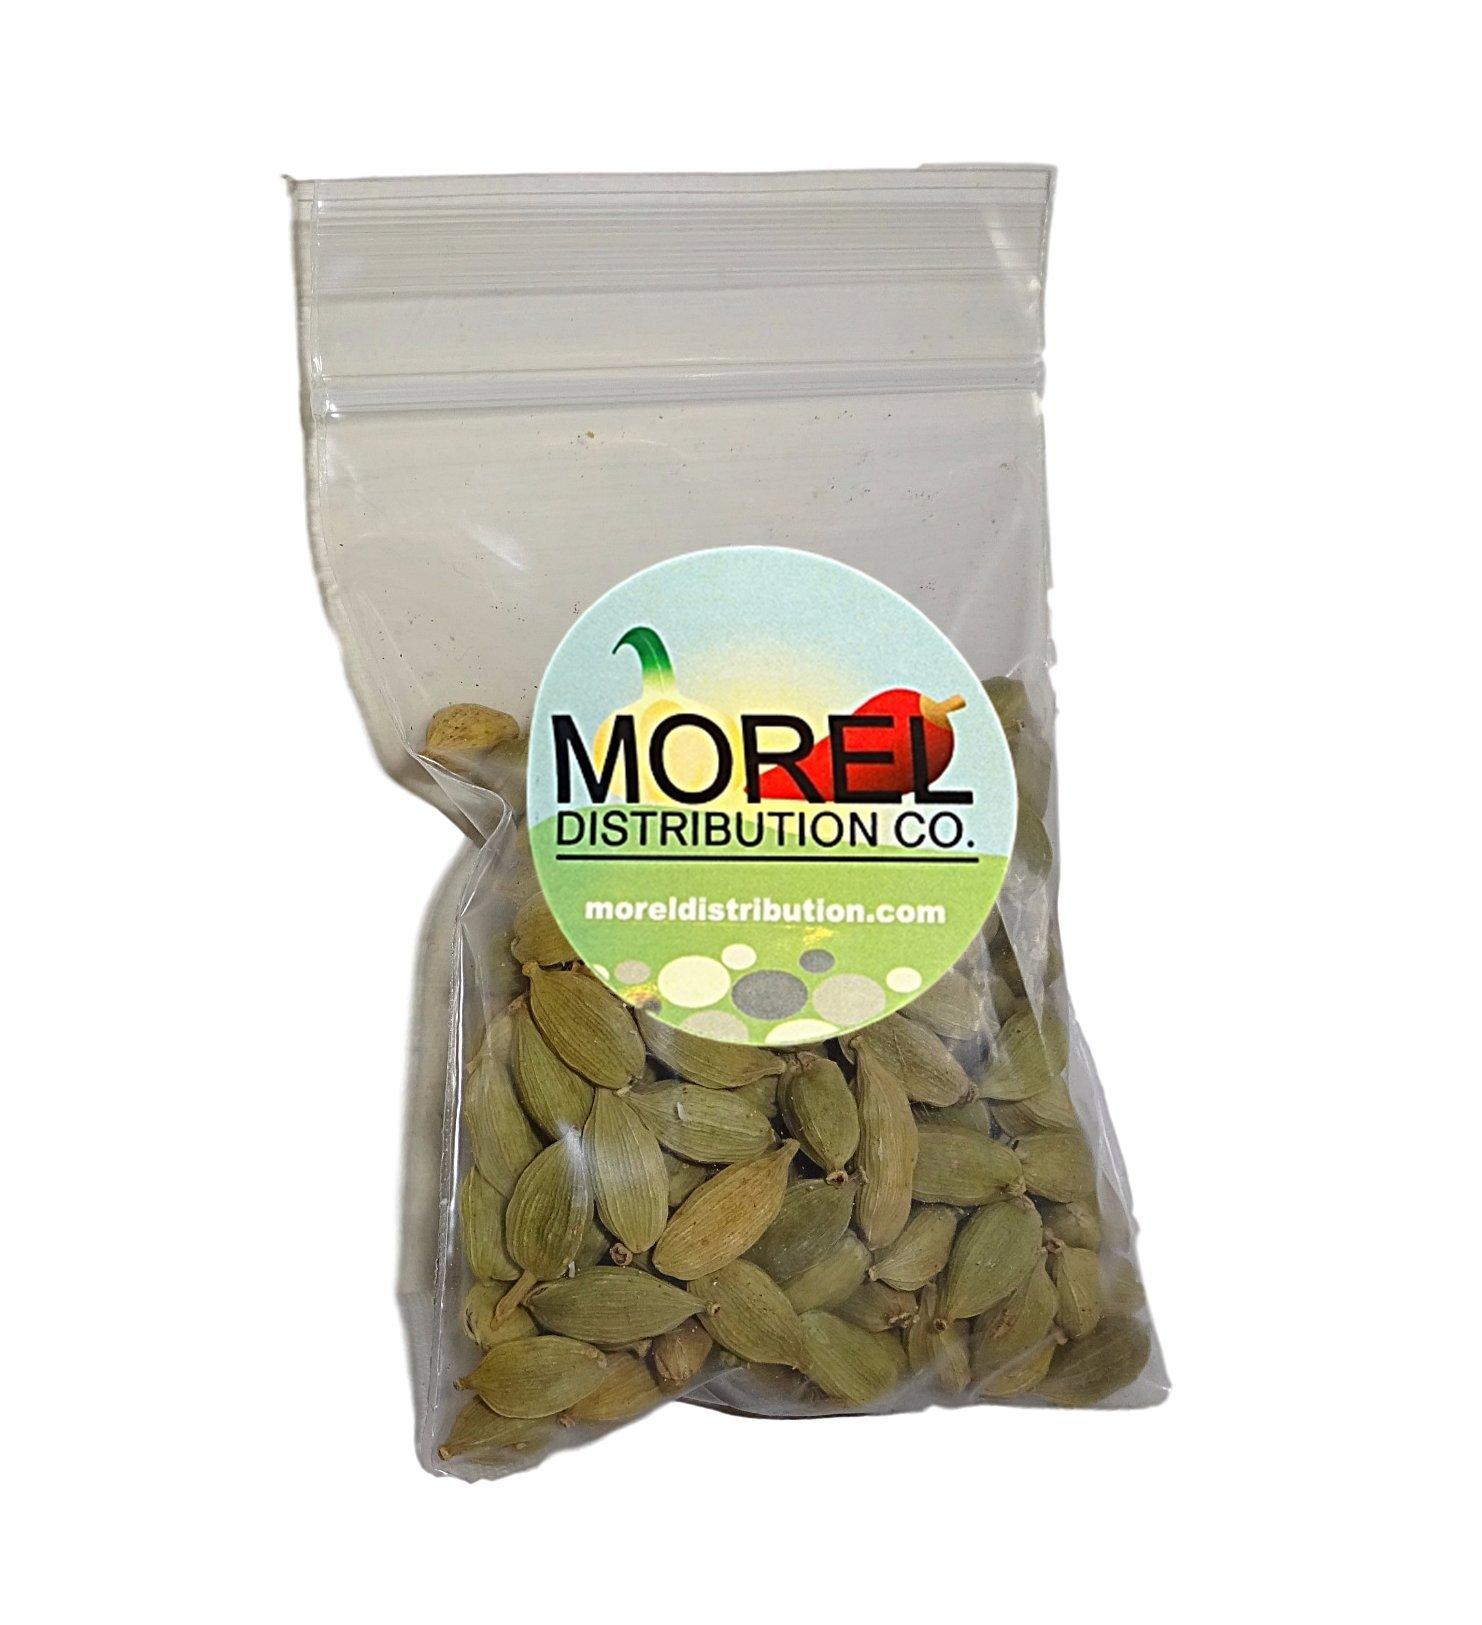 Whole Cardamom Pods/Seeds (Cardamomo) (1 oz, 2 oz, 4 oz, 6 oz, 8 oz, 12 oz, 1 lb, 2 lbs) (1 OZ) by Morel Distribution Company (Image #2)